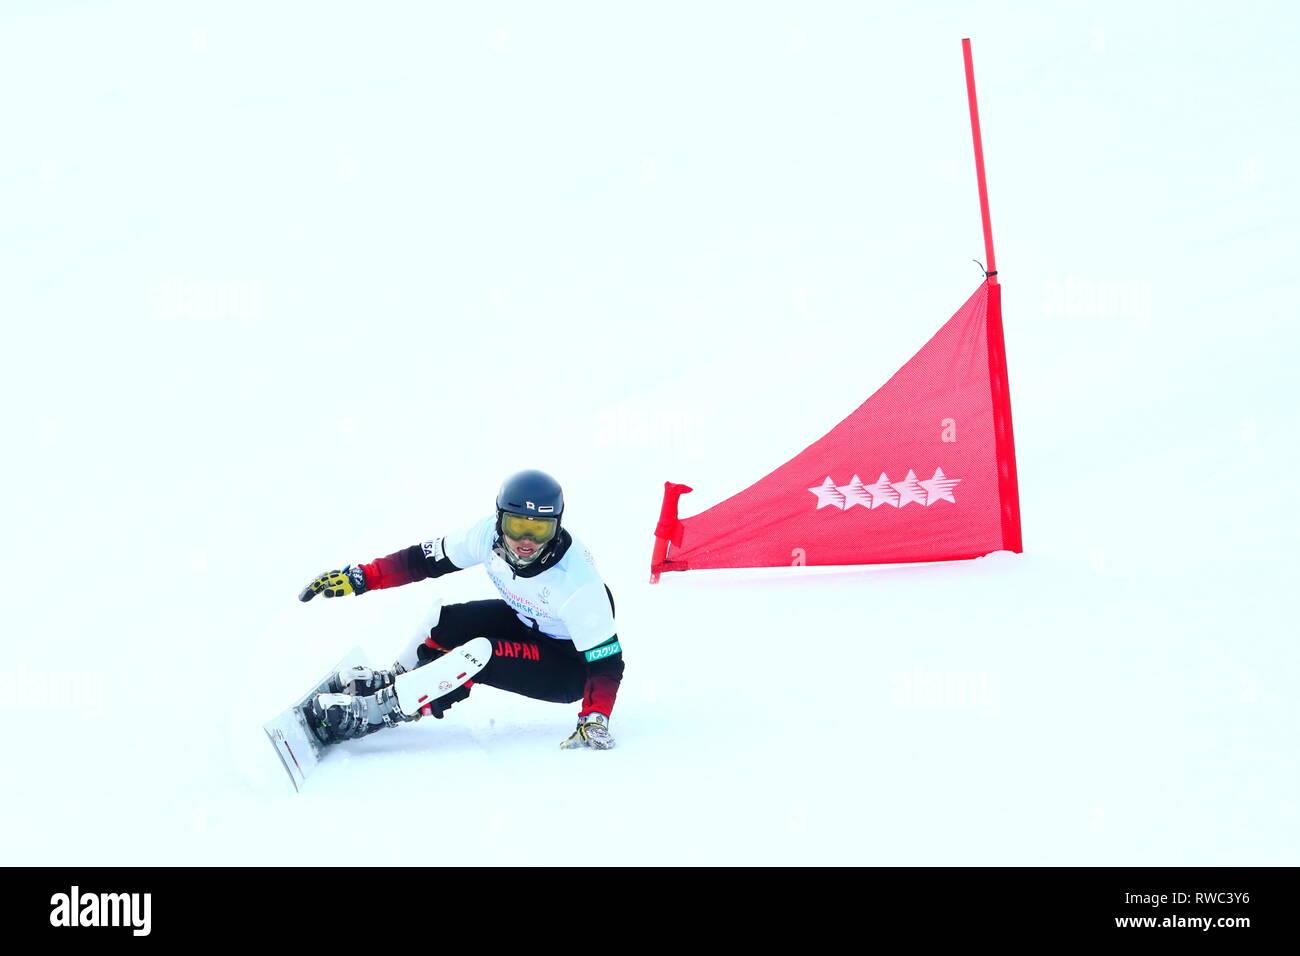 Sopka Cluster, Krasnoyarsk, Russia. 5th Mar, 2019. Hiroya Toda (JPN), MARCH 5, 2019 - Snowboarding : Men's Parallel Giant Slalom during 29th Winter Universiade Krasnoyarsk 2019 at Sopka Cluster, Krasnoyarsk, Russia. Credit: Naoki Nishimura/AFLO SPORT/Alamy Live News Stock Photo